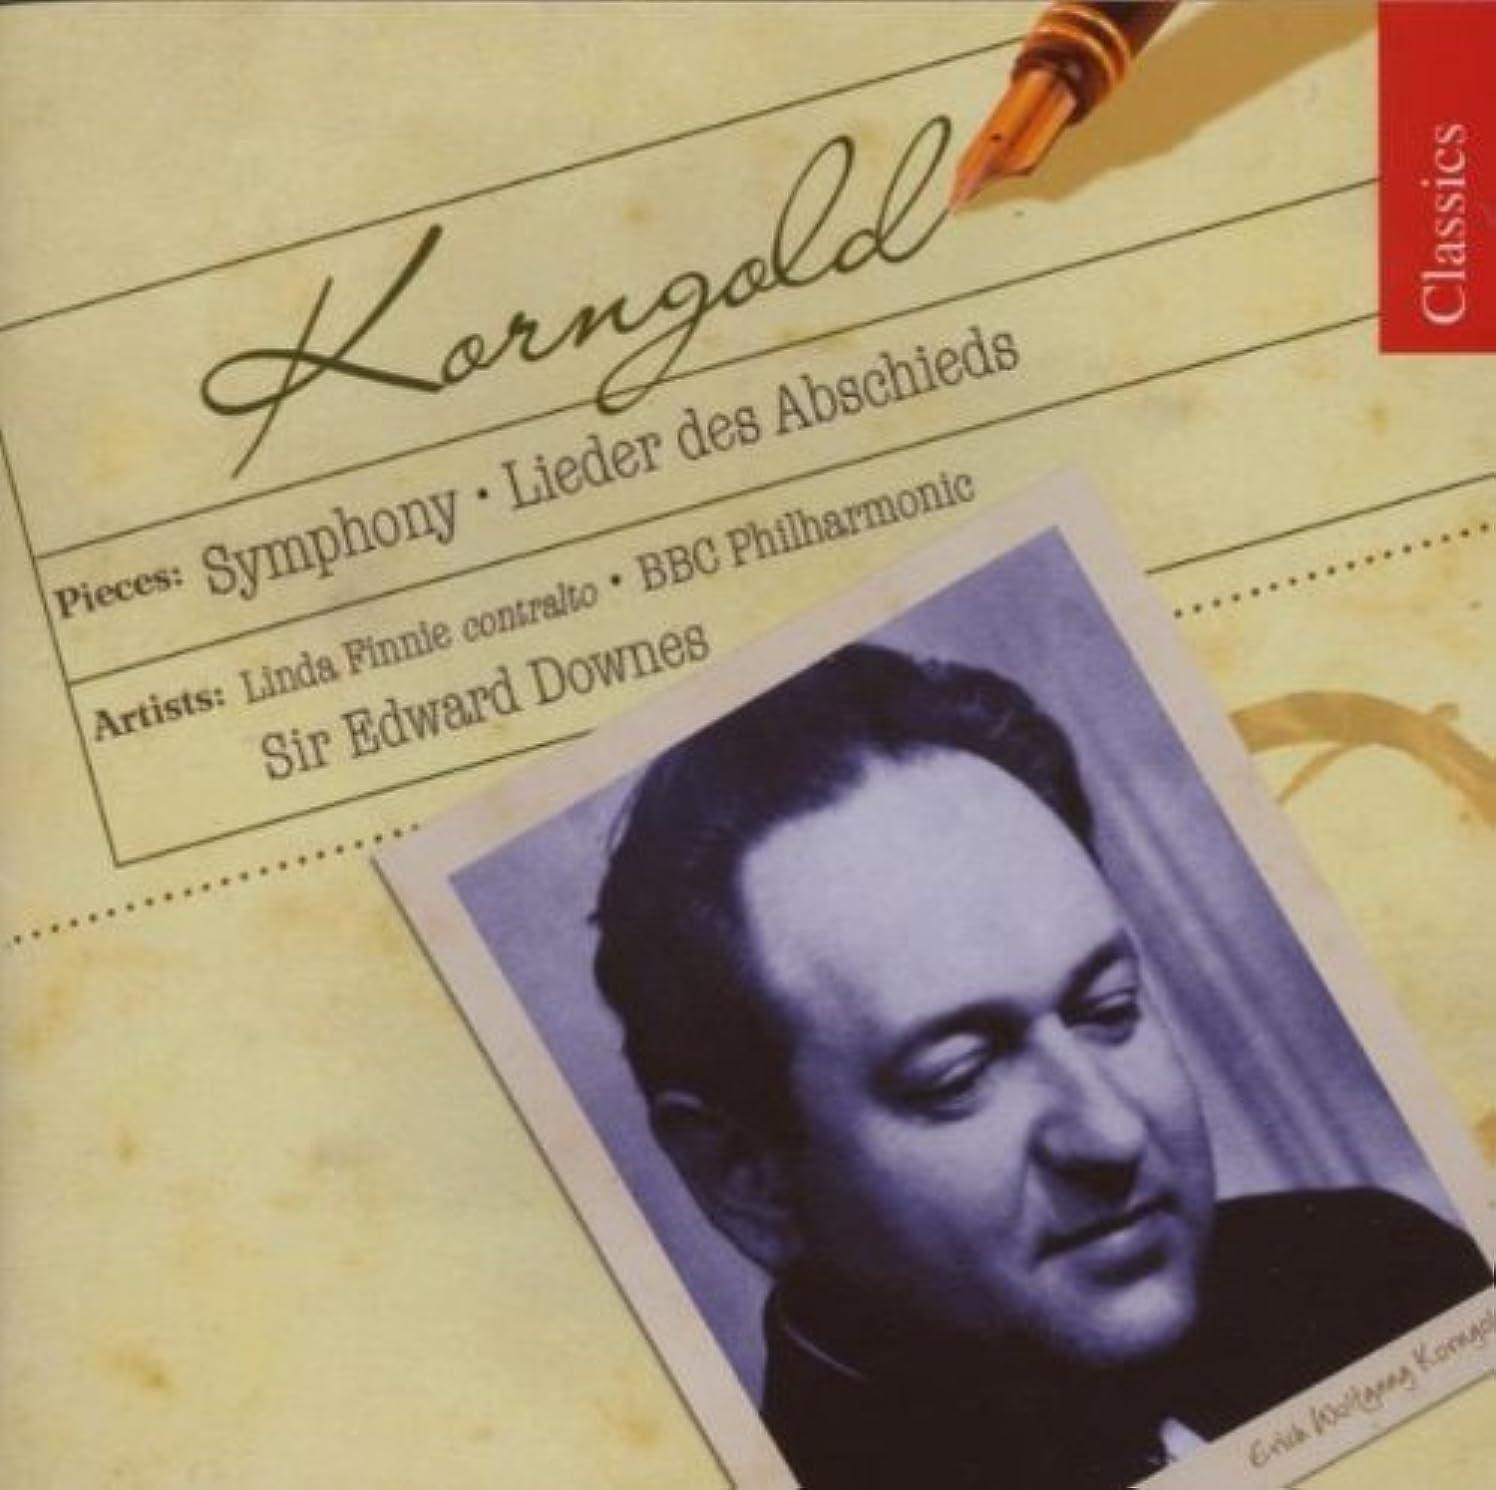 Korngold: Symphony; Lieder des Abschieds by Erich Wolfgang Korngold (2007-08-28)